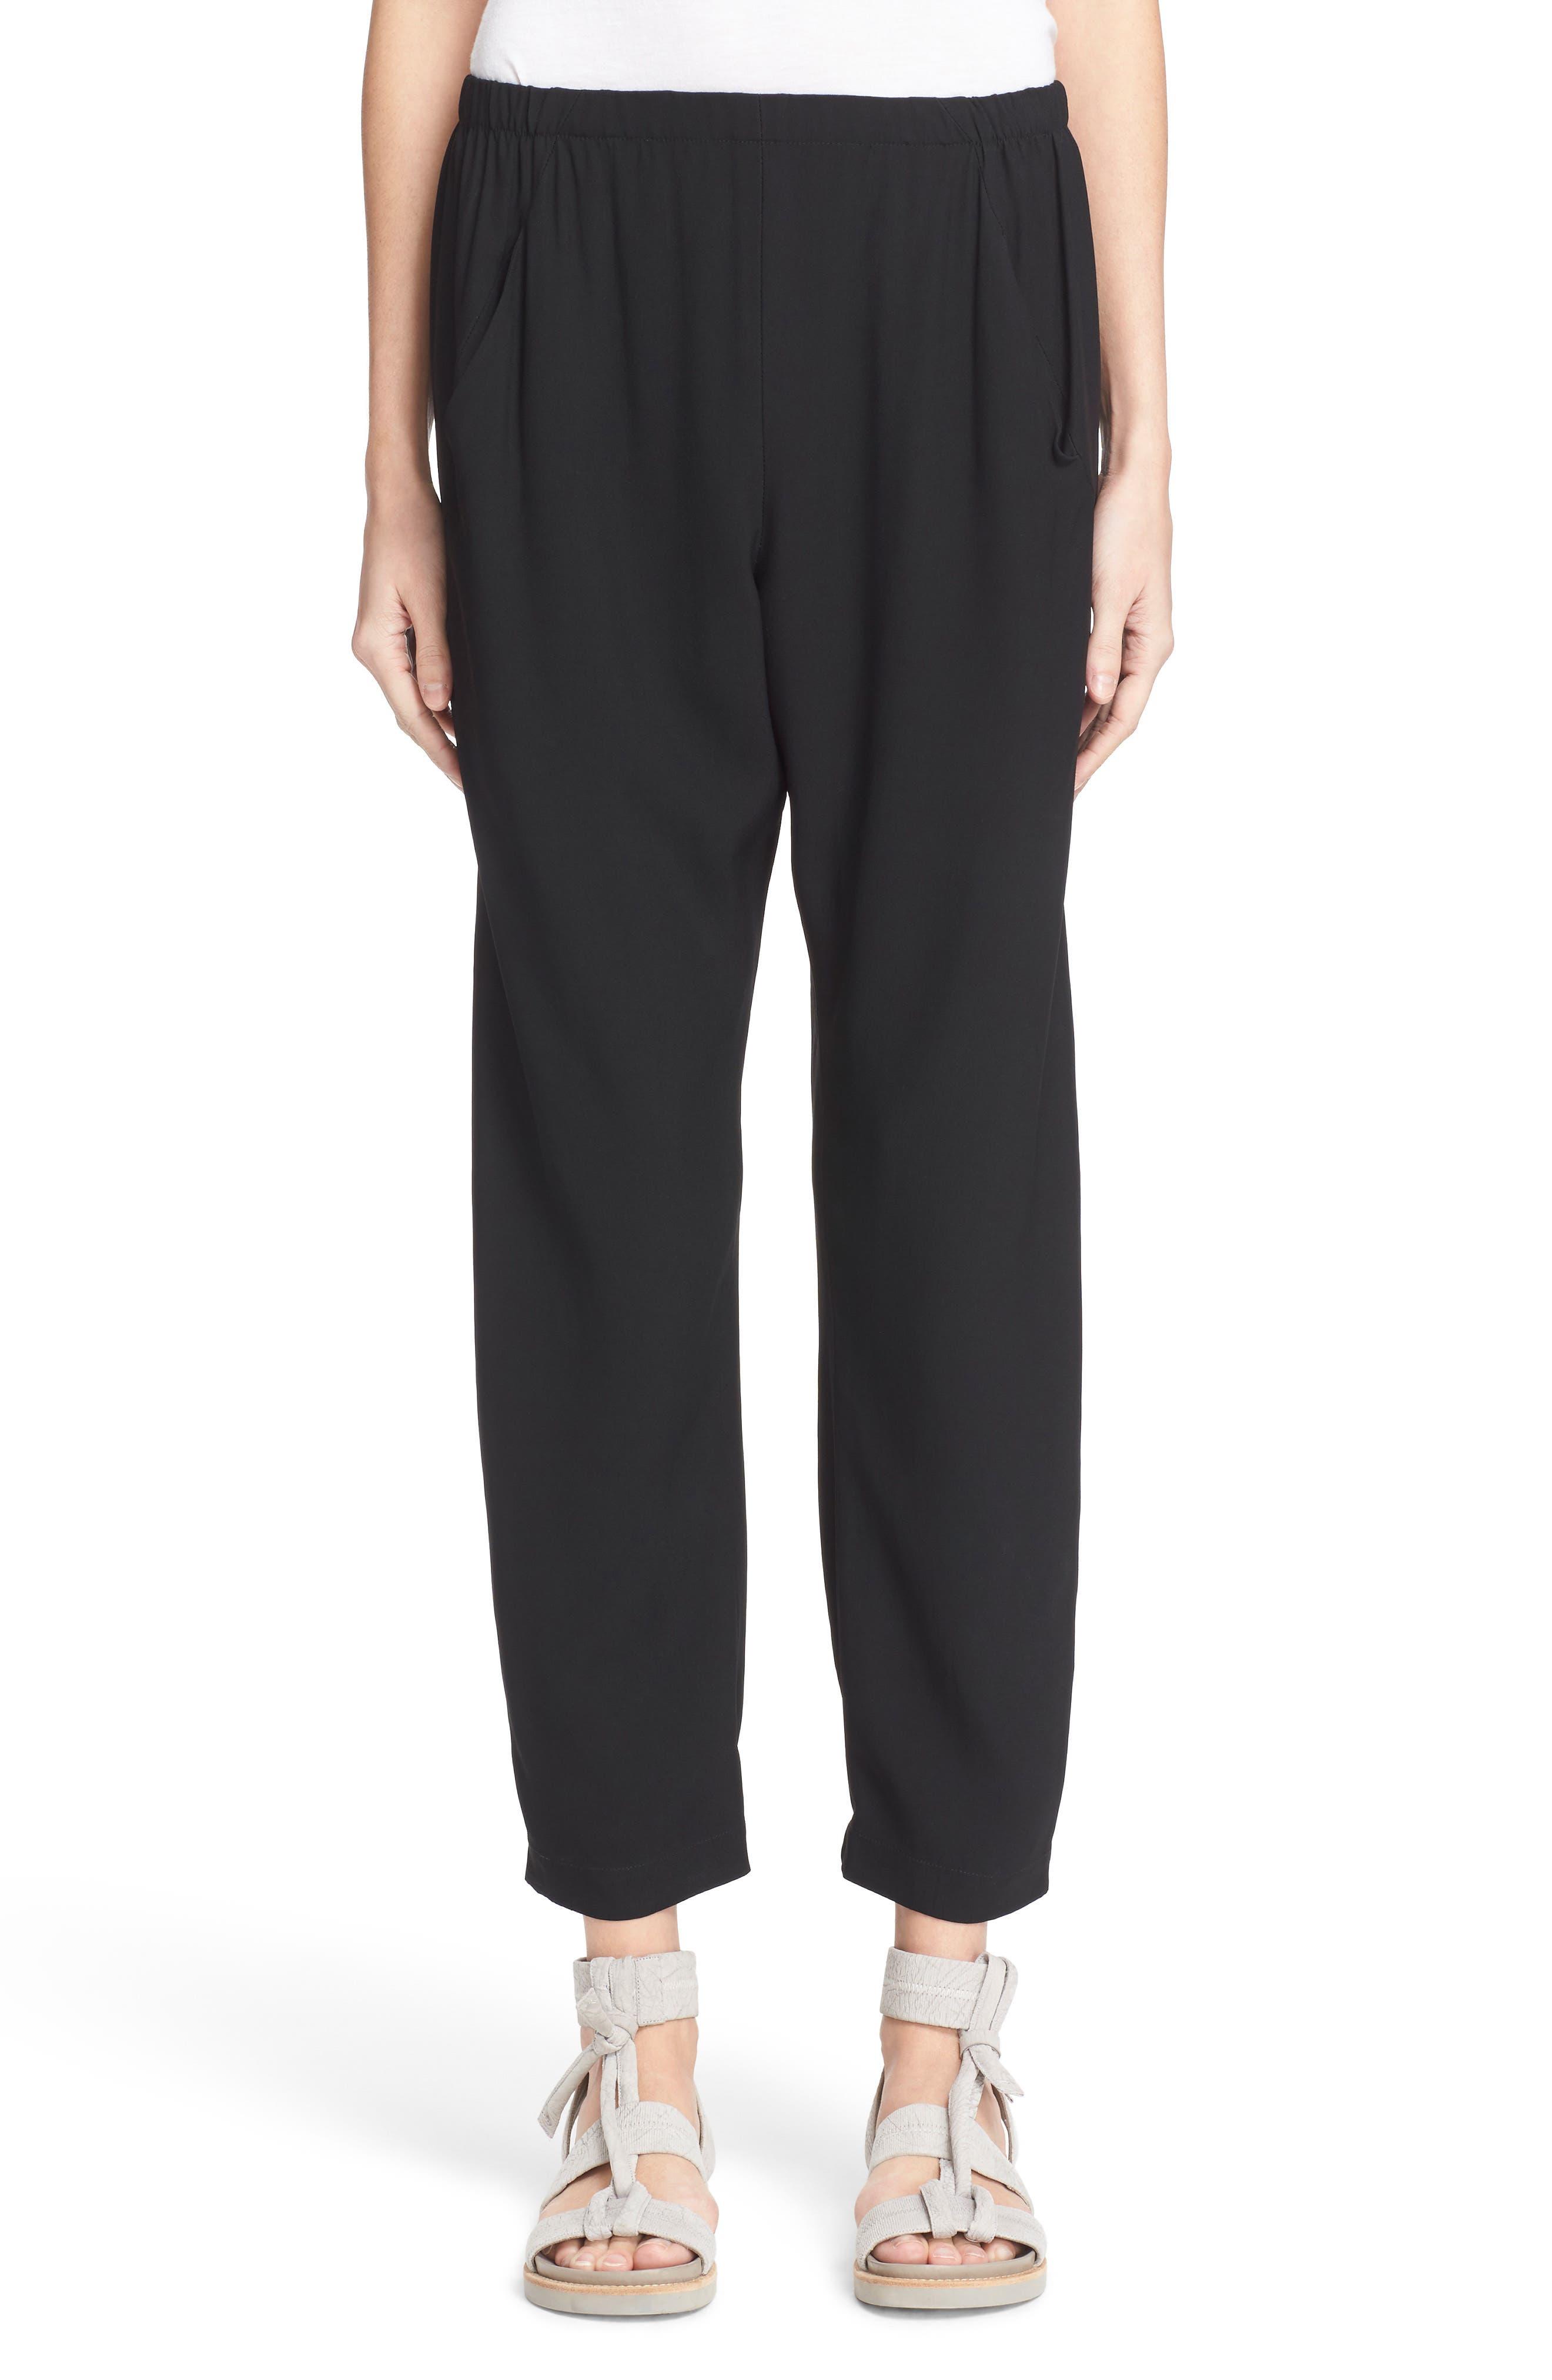 Gabi Drape Trousers,                         Main,                         color, Black